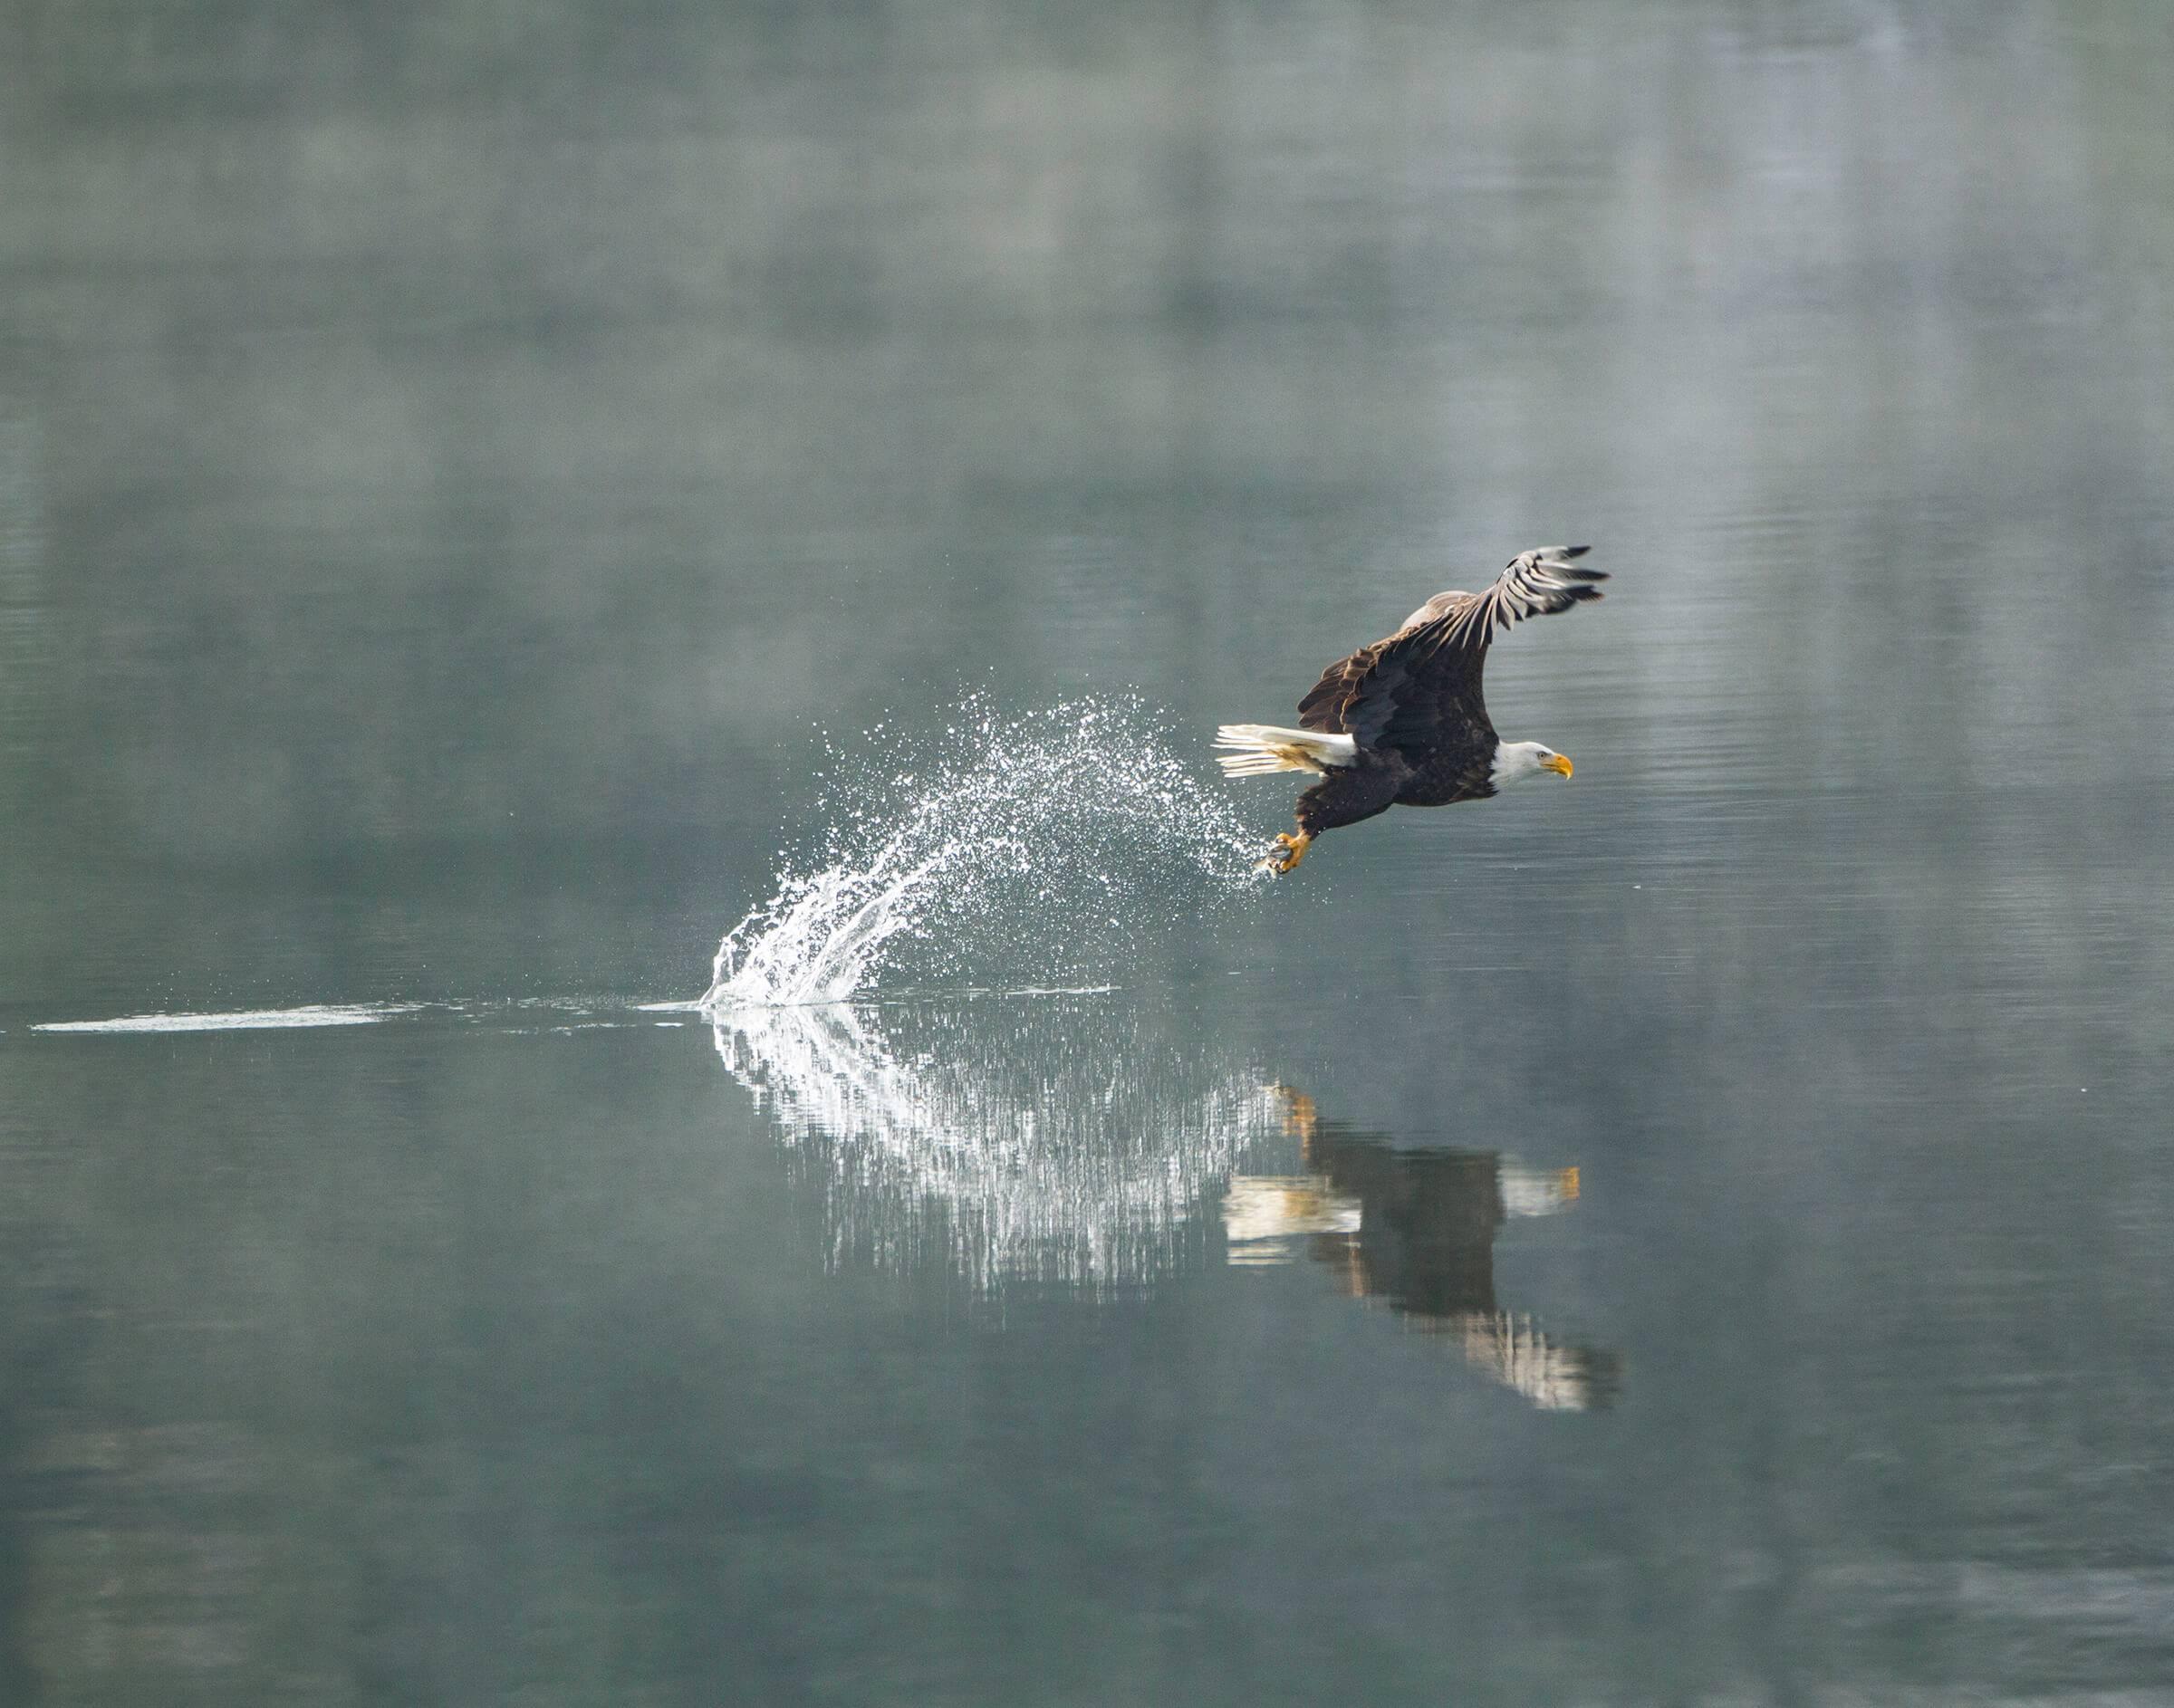 Eagle watching, Coeur d'Alene. Photo Credit: Lake Coeur d'Alene Cruises